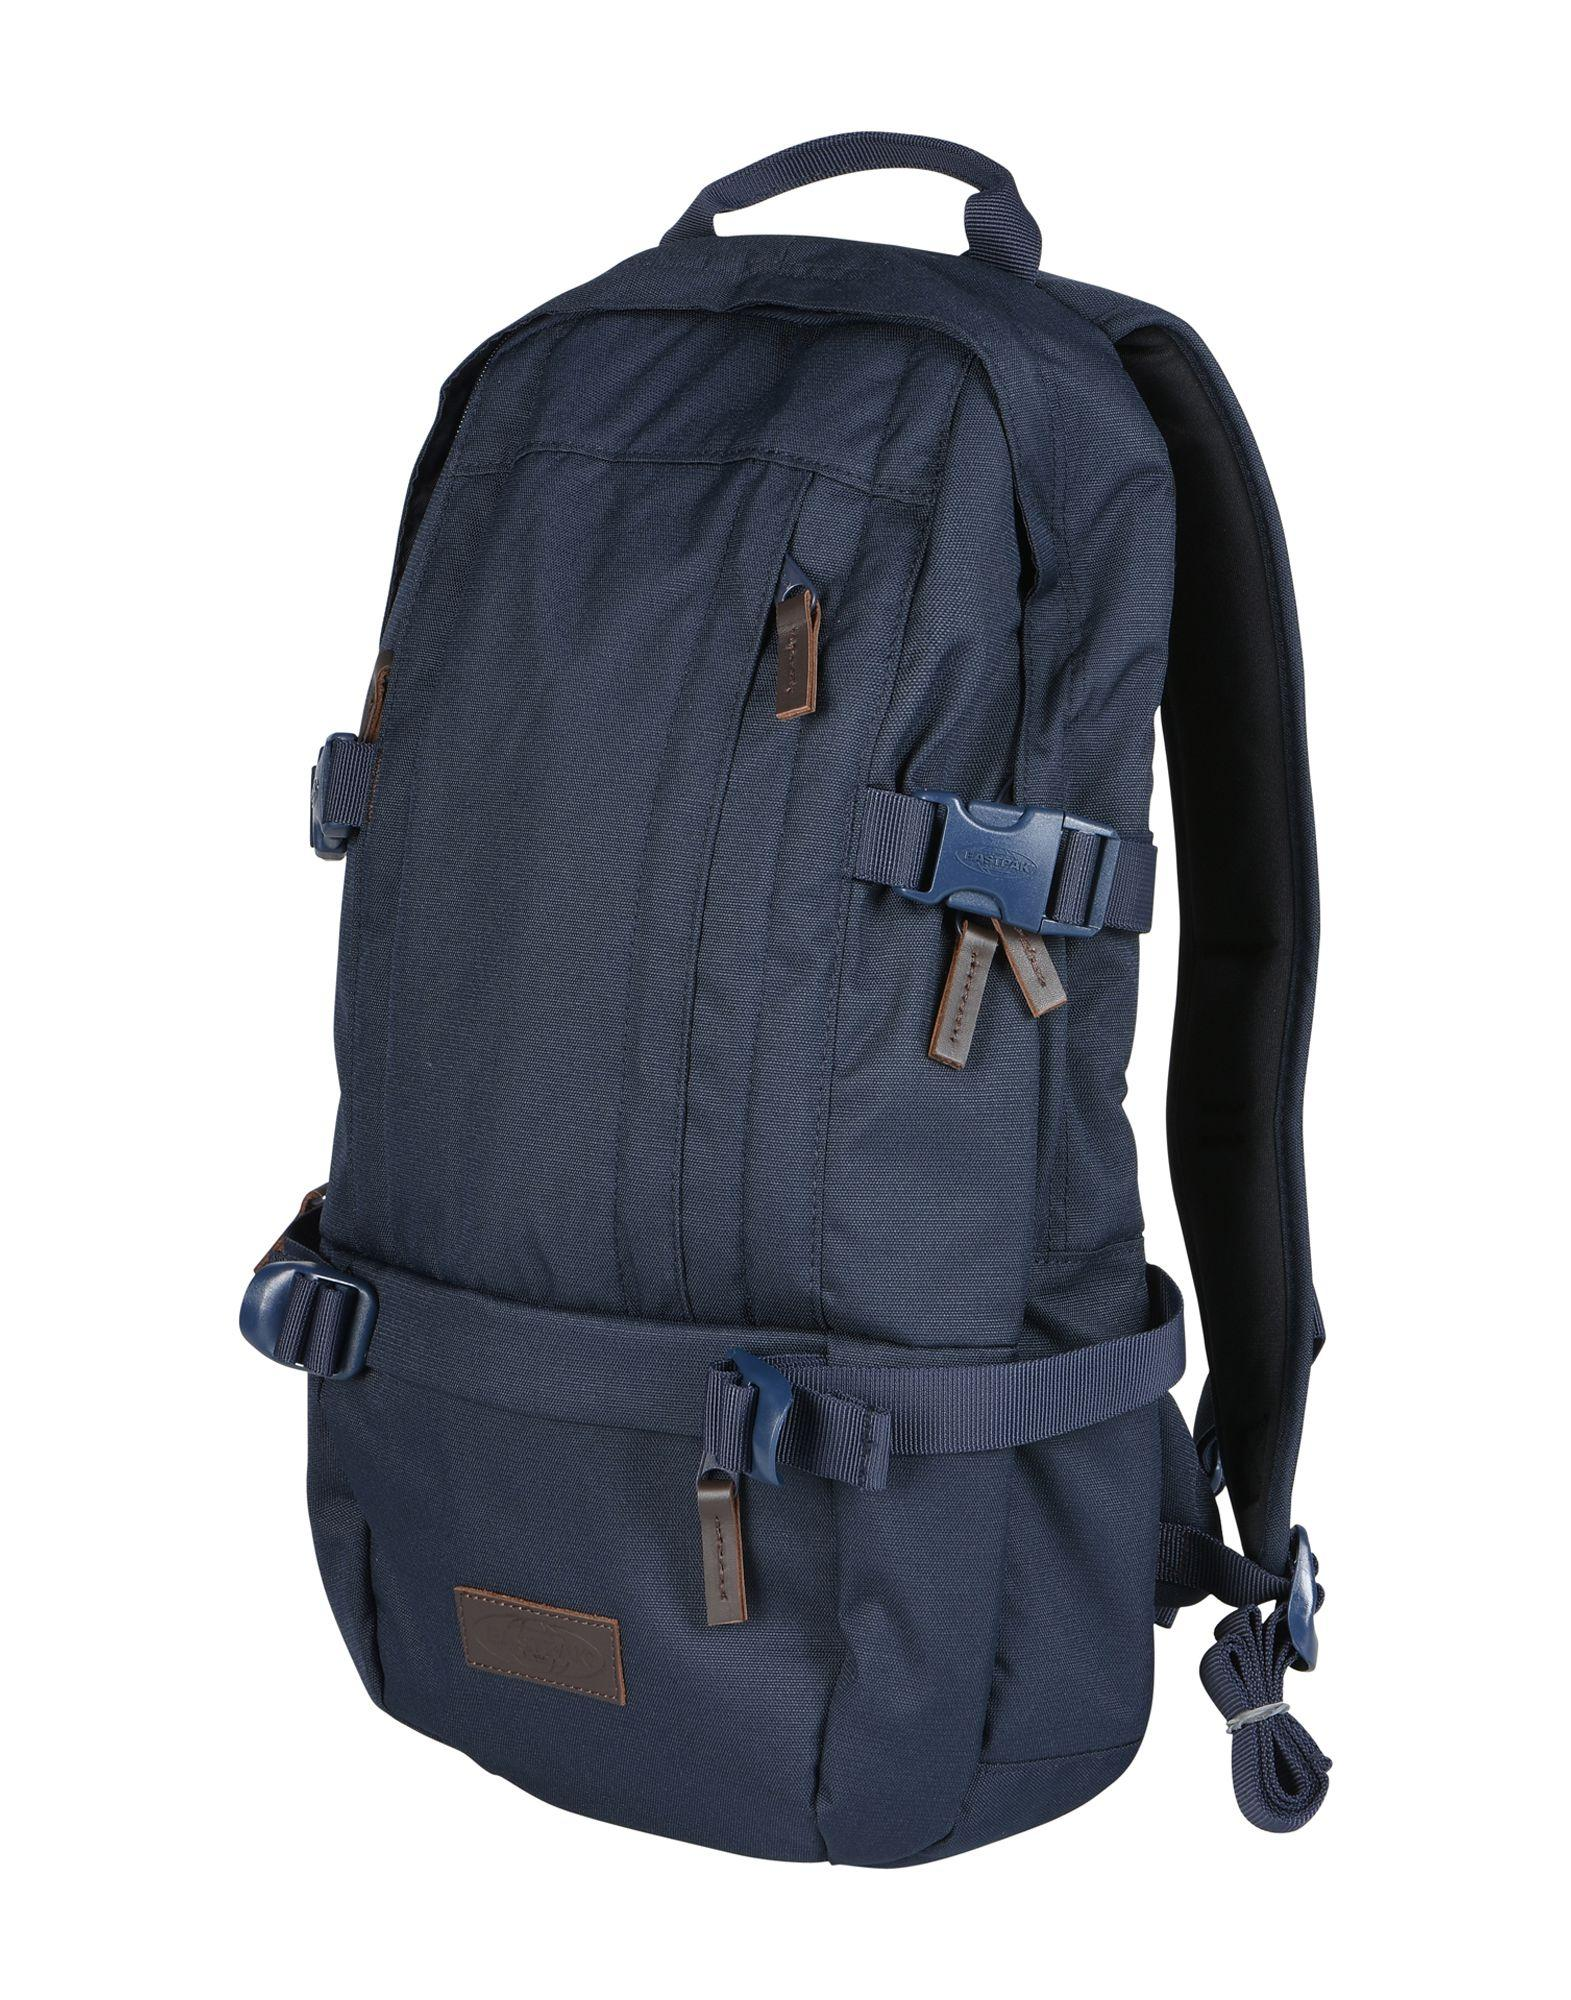 Eastpak Backpack   Fanny Pack In Dark Blue